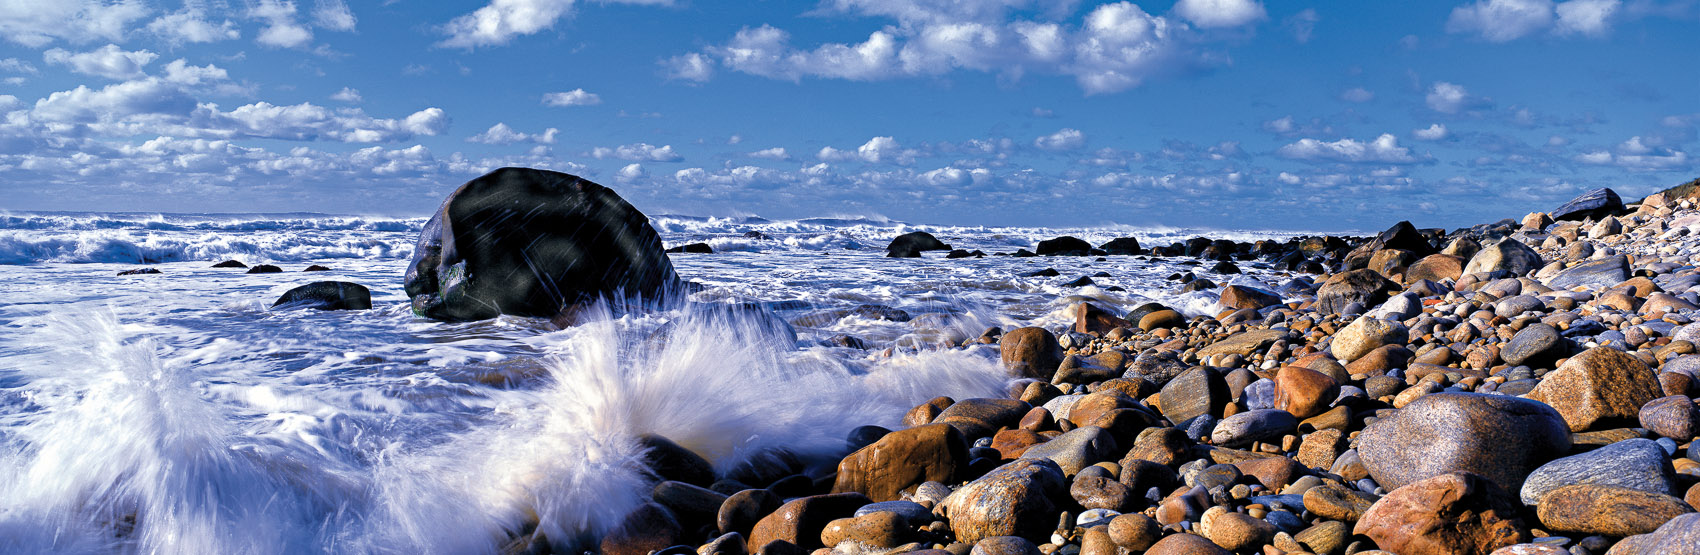 SplashingWater_Montauk